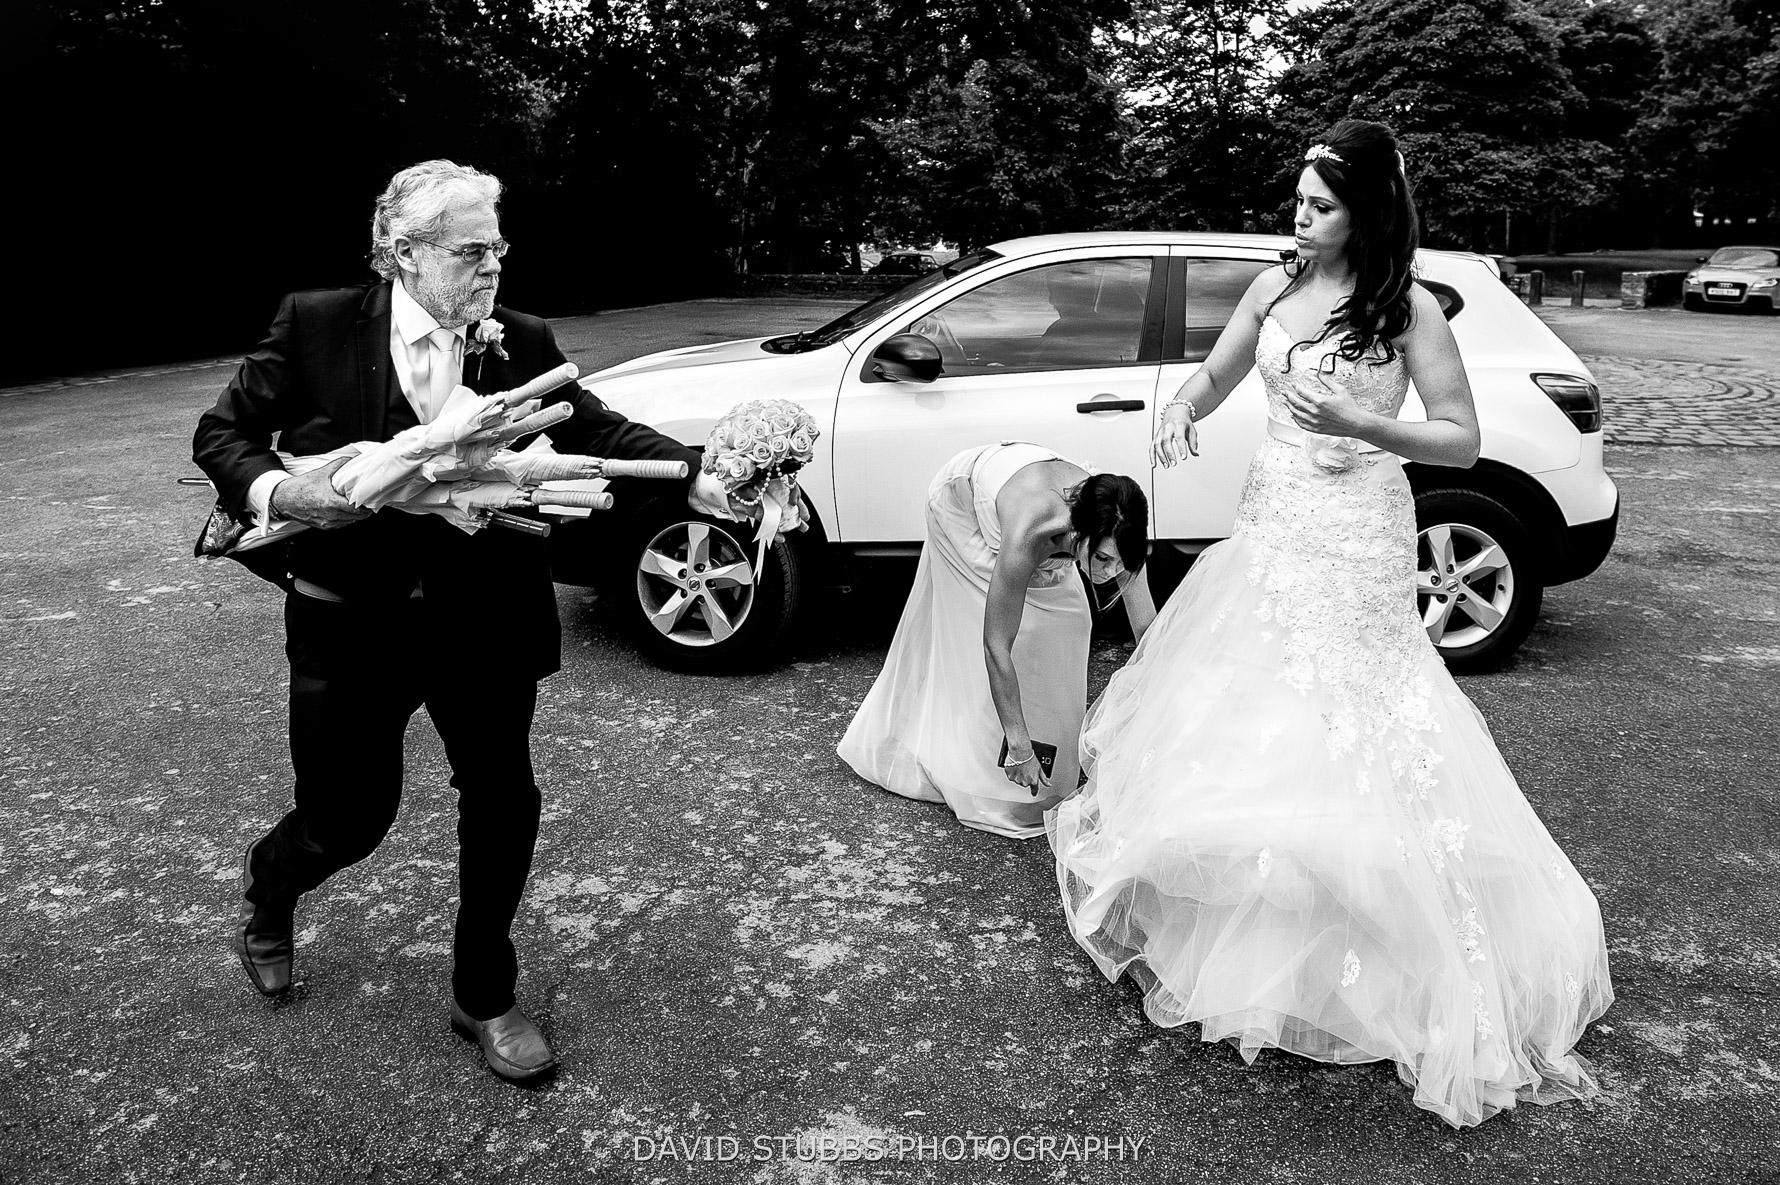 panic out of wedding car